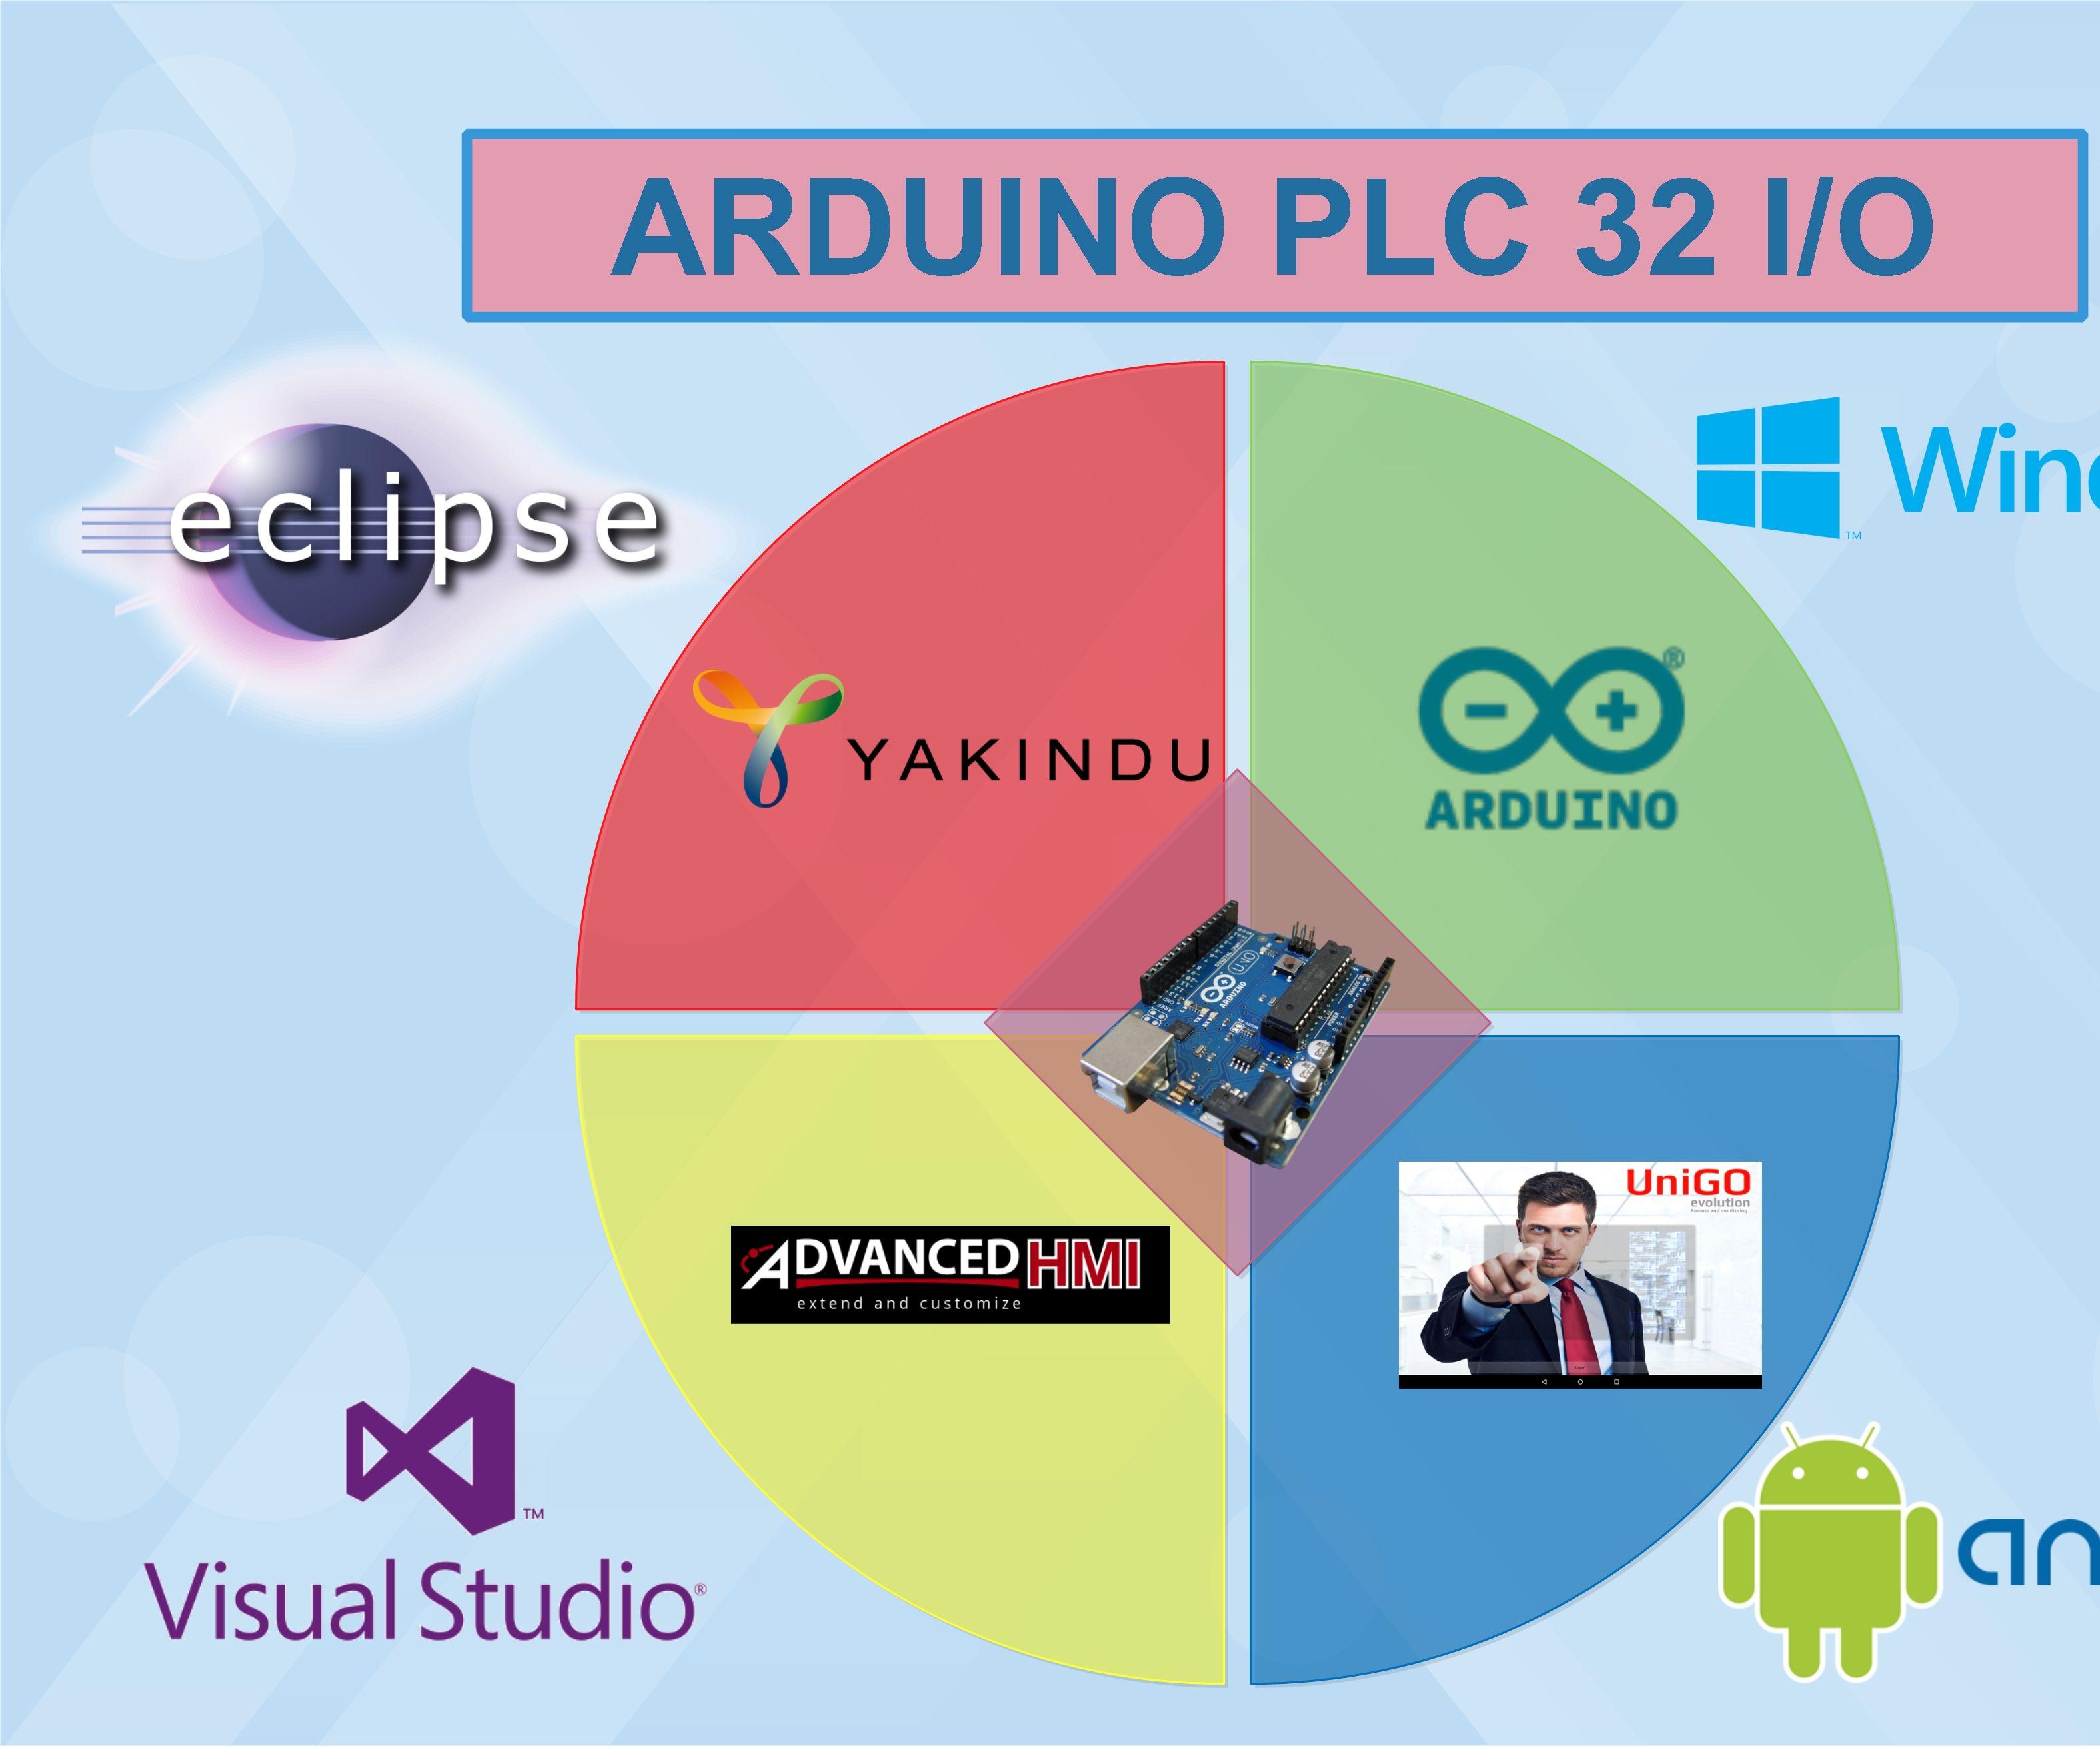 Arduino PLC 32 I/O+State Machine+SCADA or HMI: 8 Steps